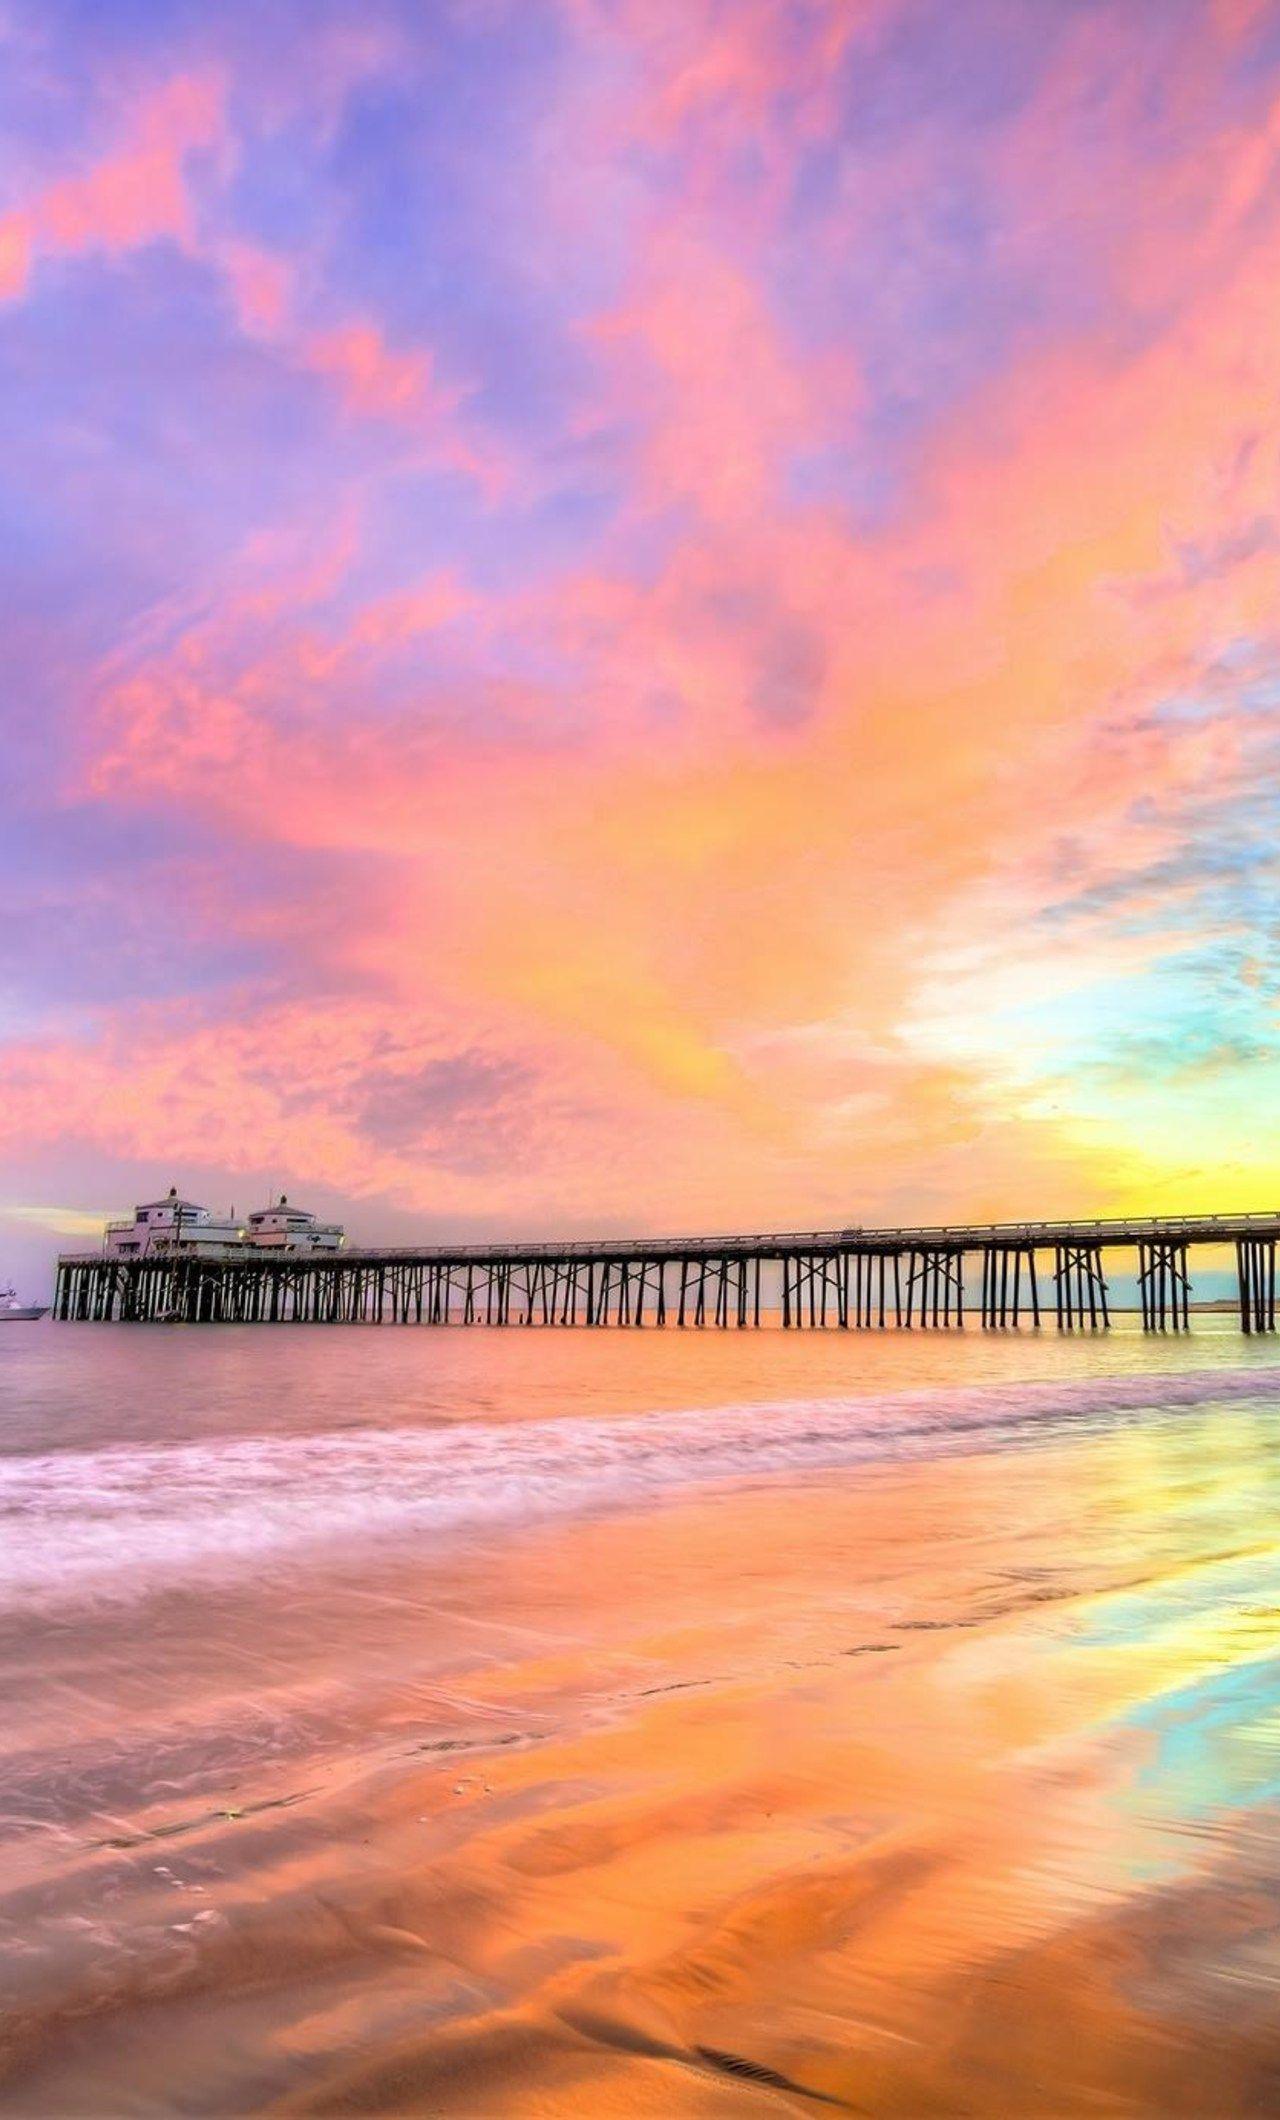 California Beach Iphone Wallpapers Top Free California Beach